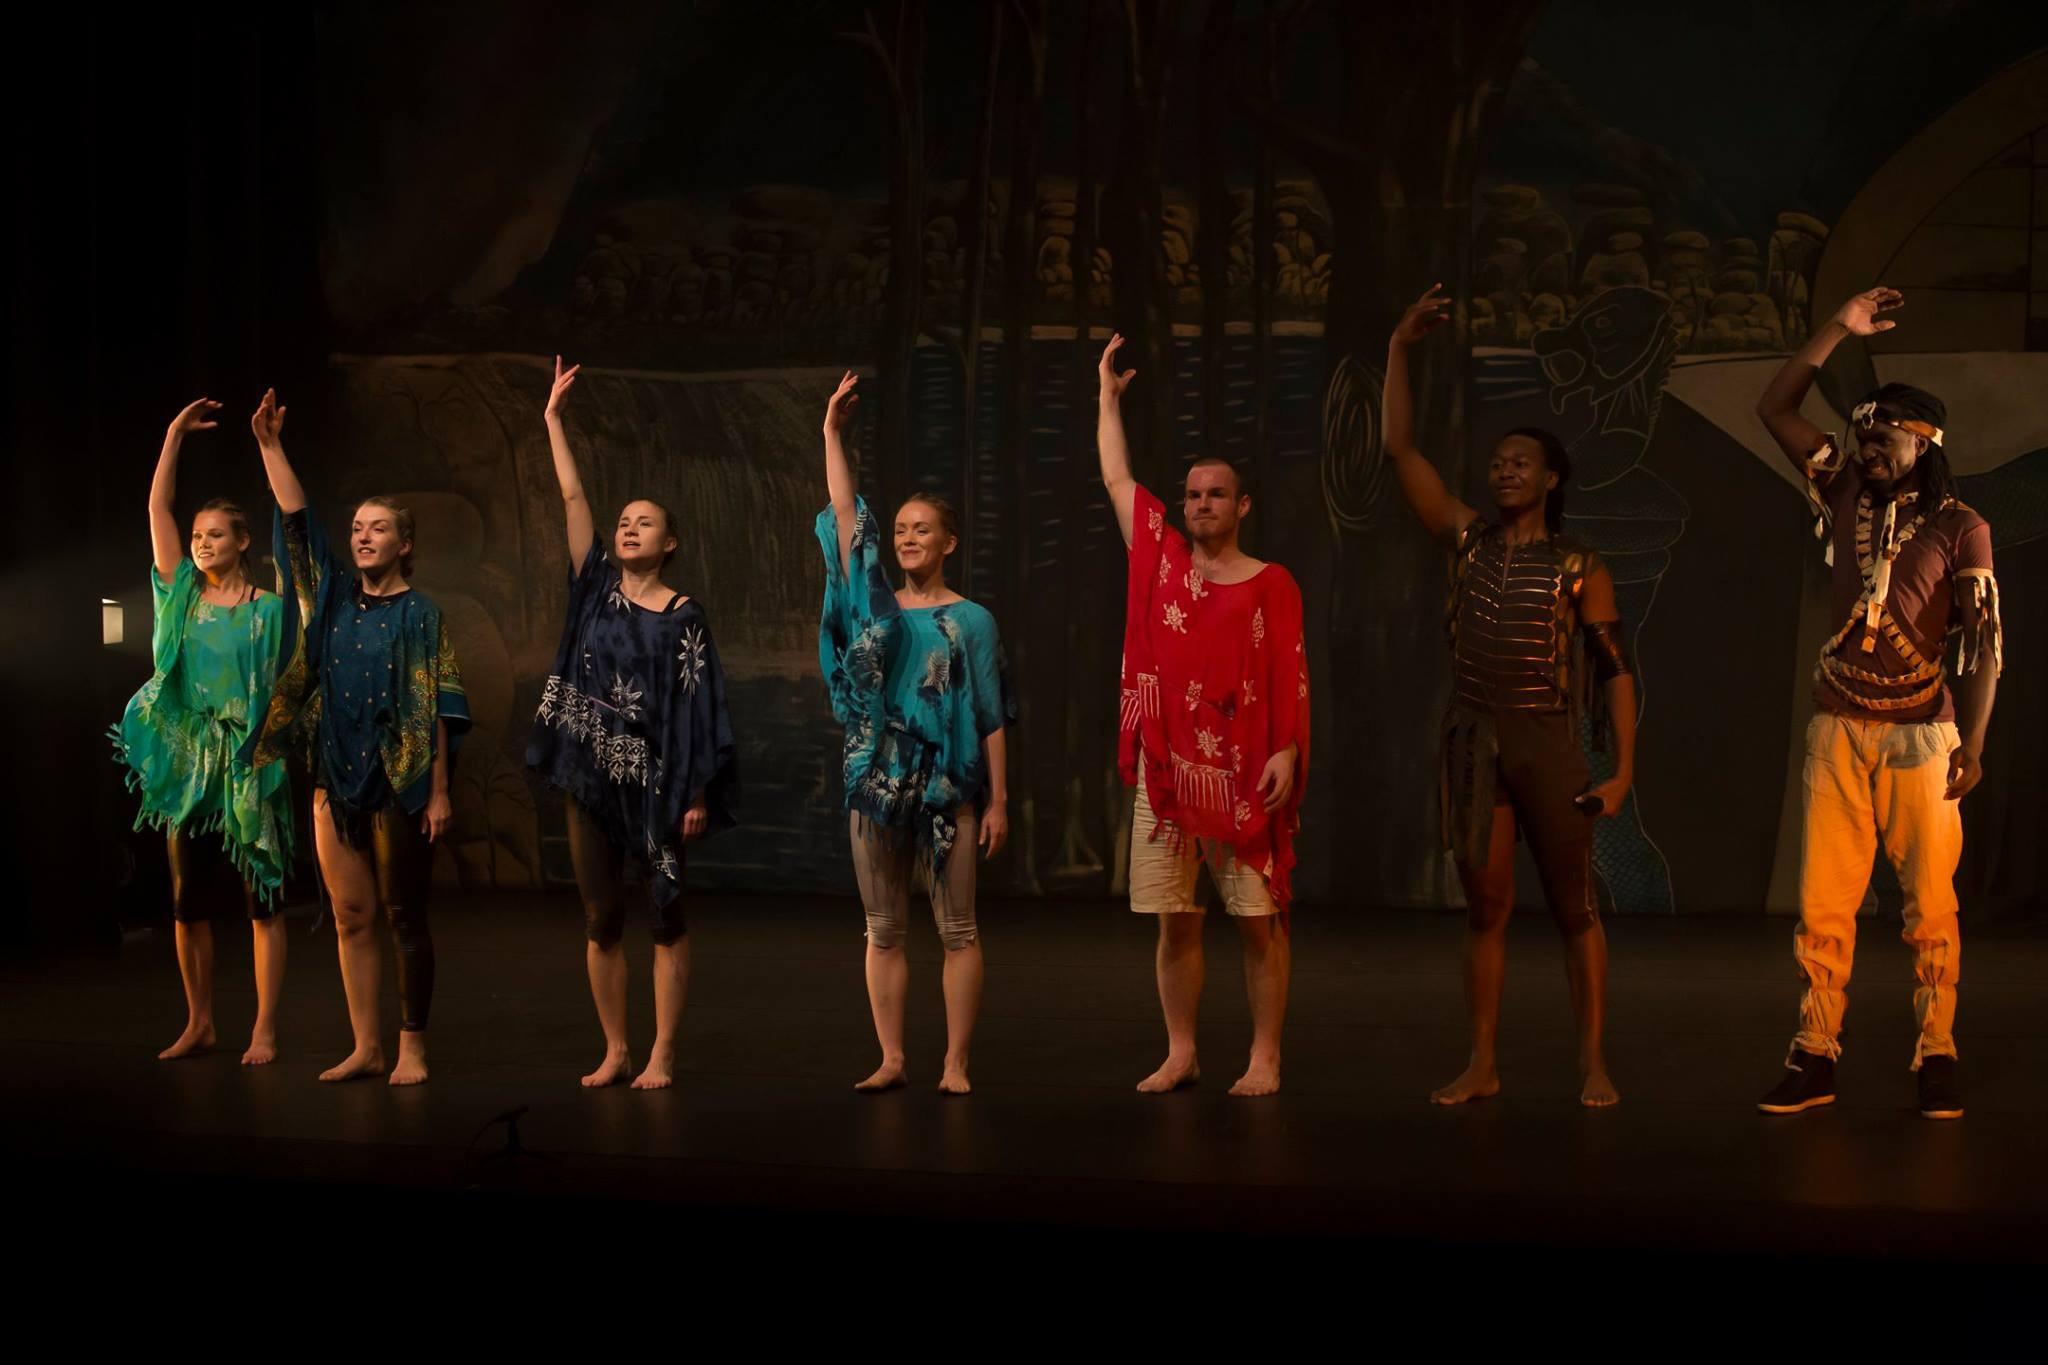 The Nyami Nyami 2018 cast f.l: Mari Sofie Askeland, Sara Steen Holvik, Elisabeth Ludwig, Ingrid S. Nyhus, Eivind Linn, Tendai Makurumbandi, Othnell Mangoma Moyo